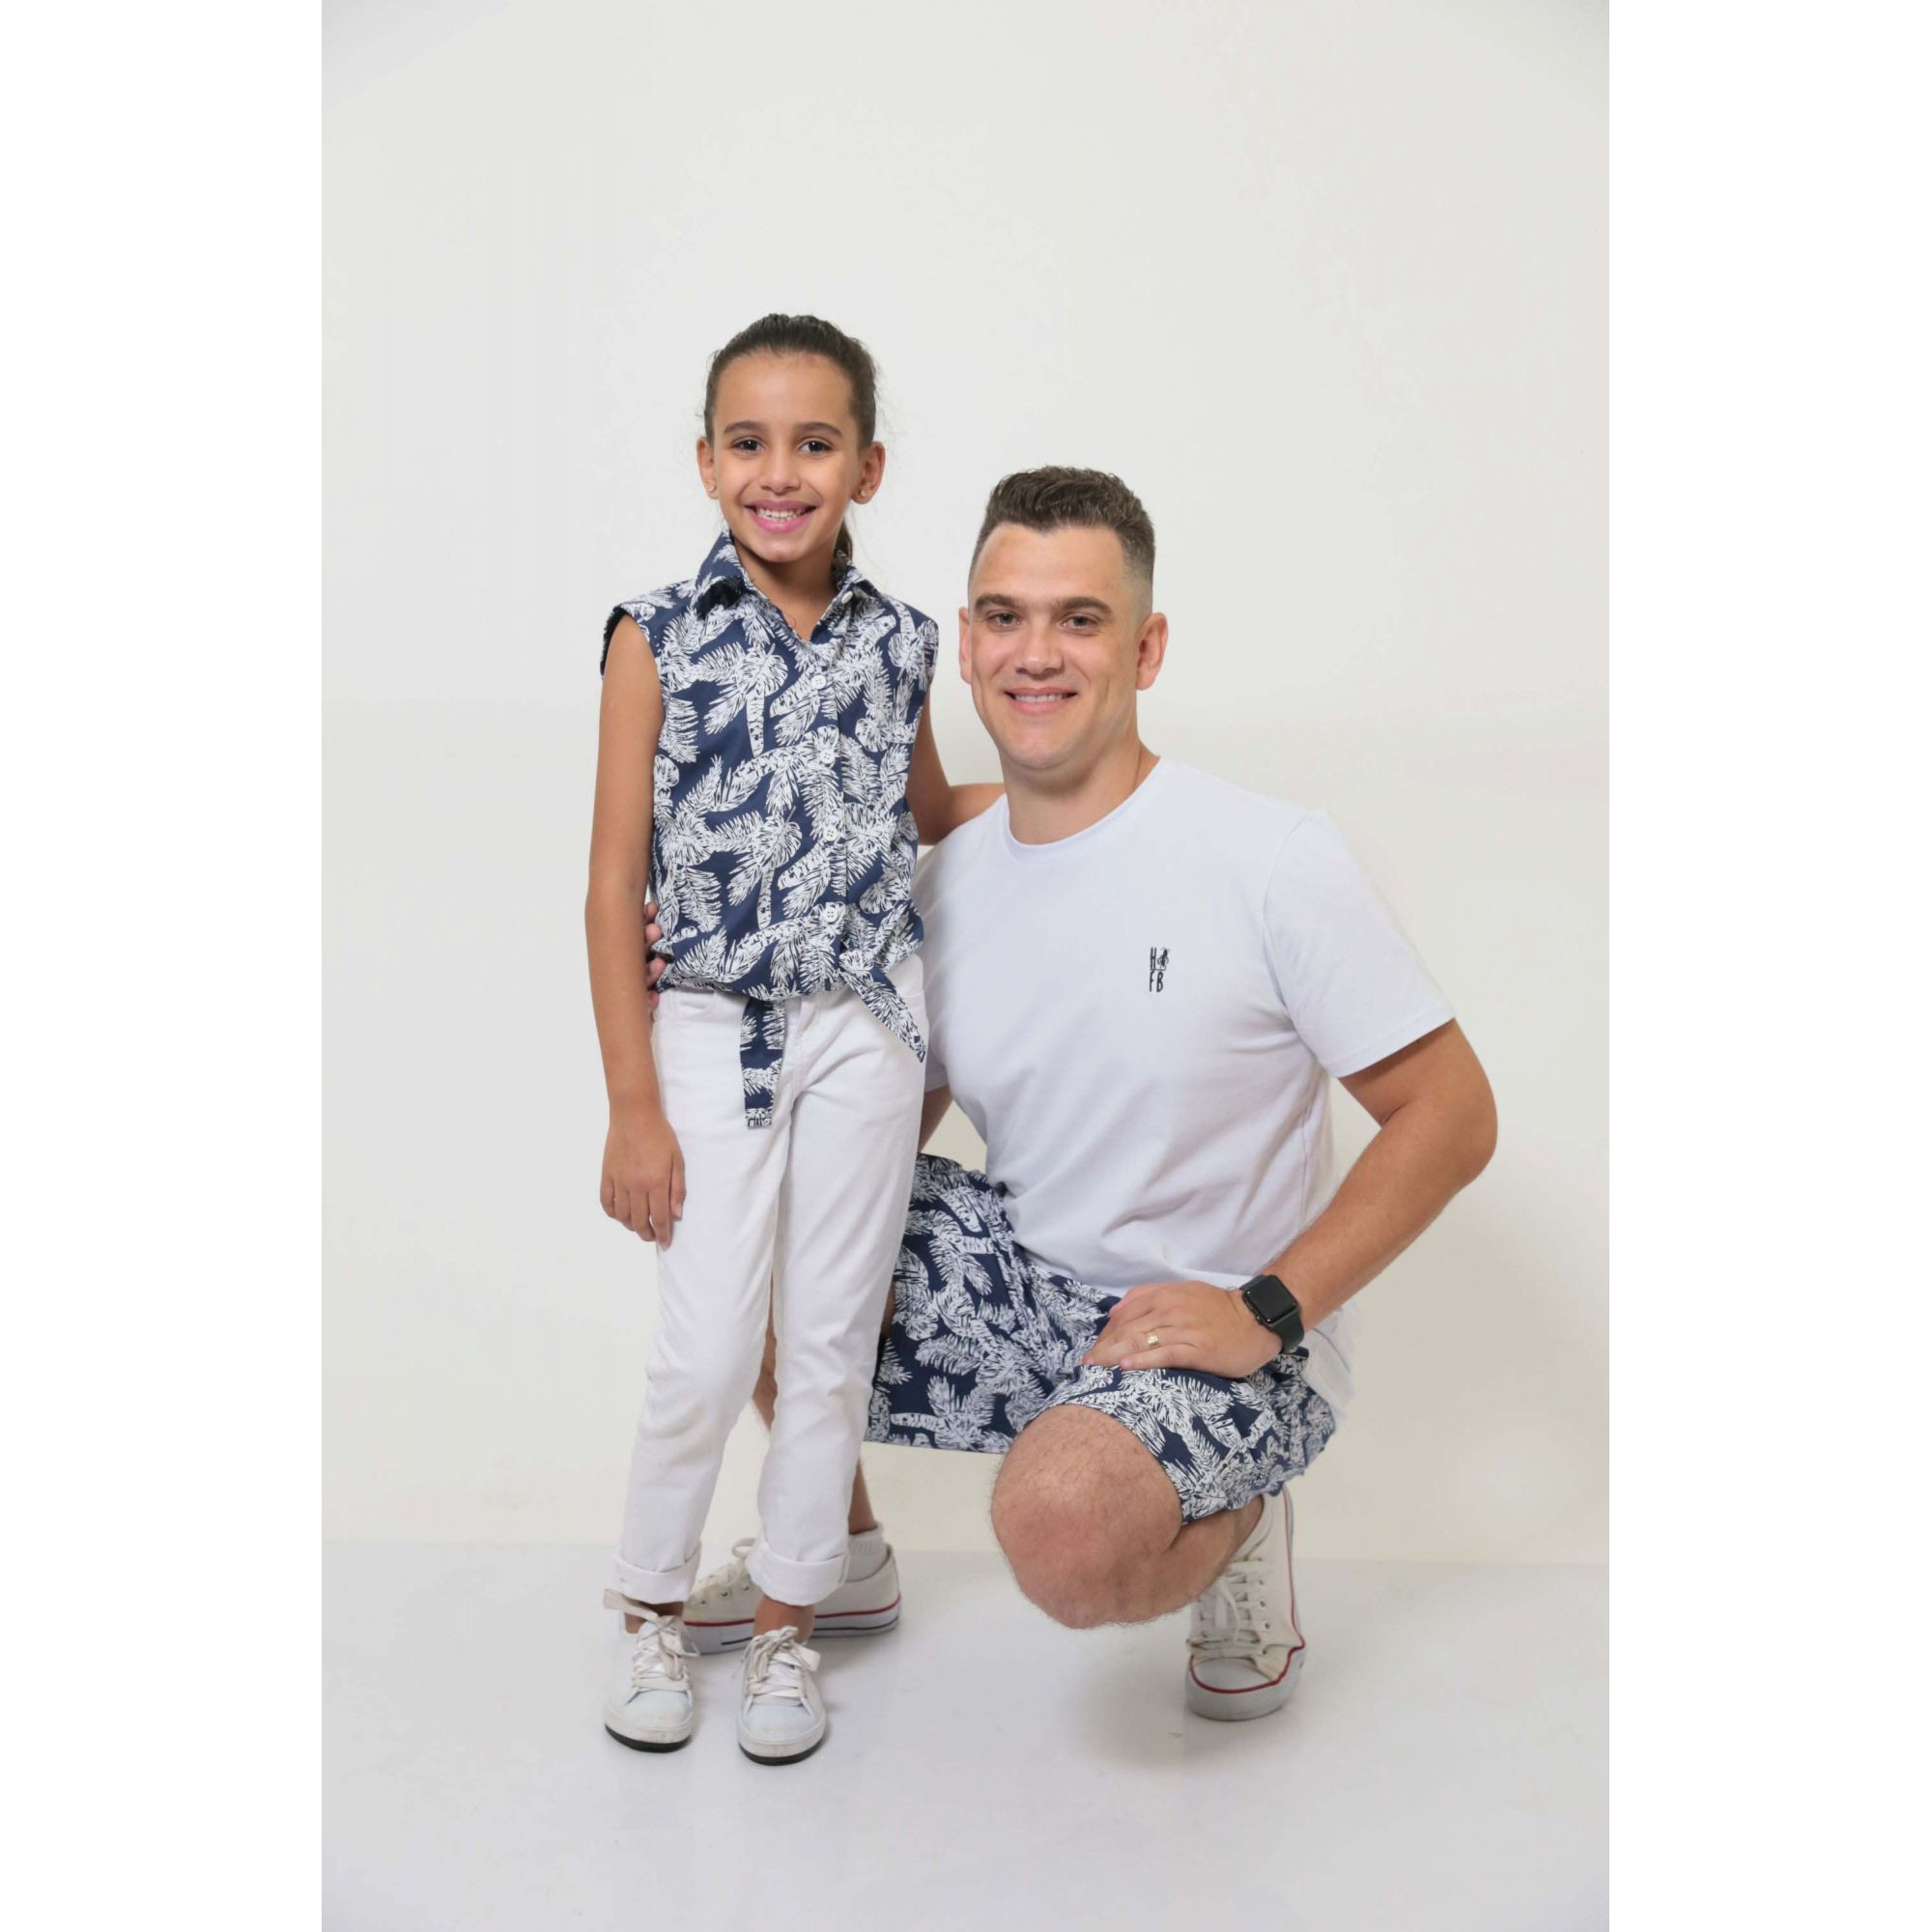 PAI E FILHA > Bermuda Masculina + Camisa Feminina Infantil Azul Floresta [Coleção Tal Pai Tal Filha]